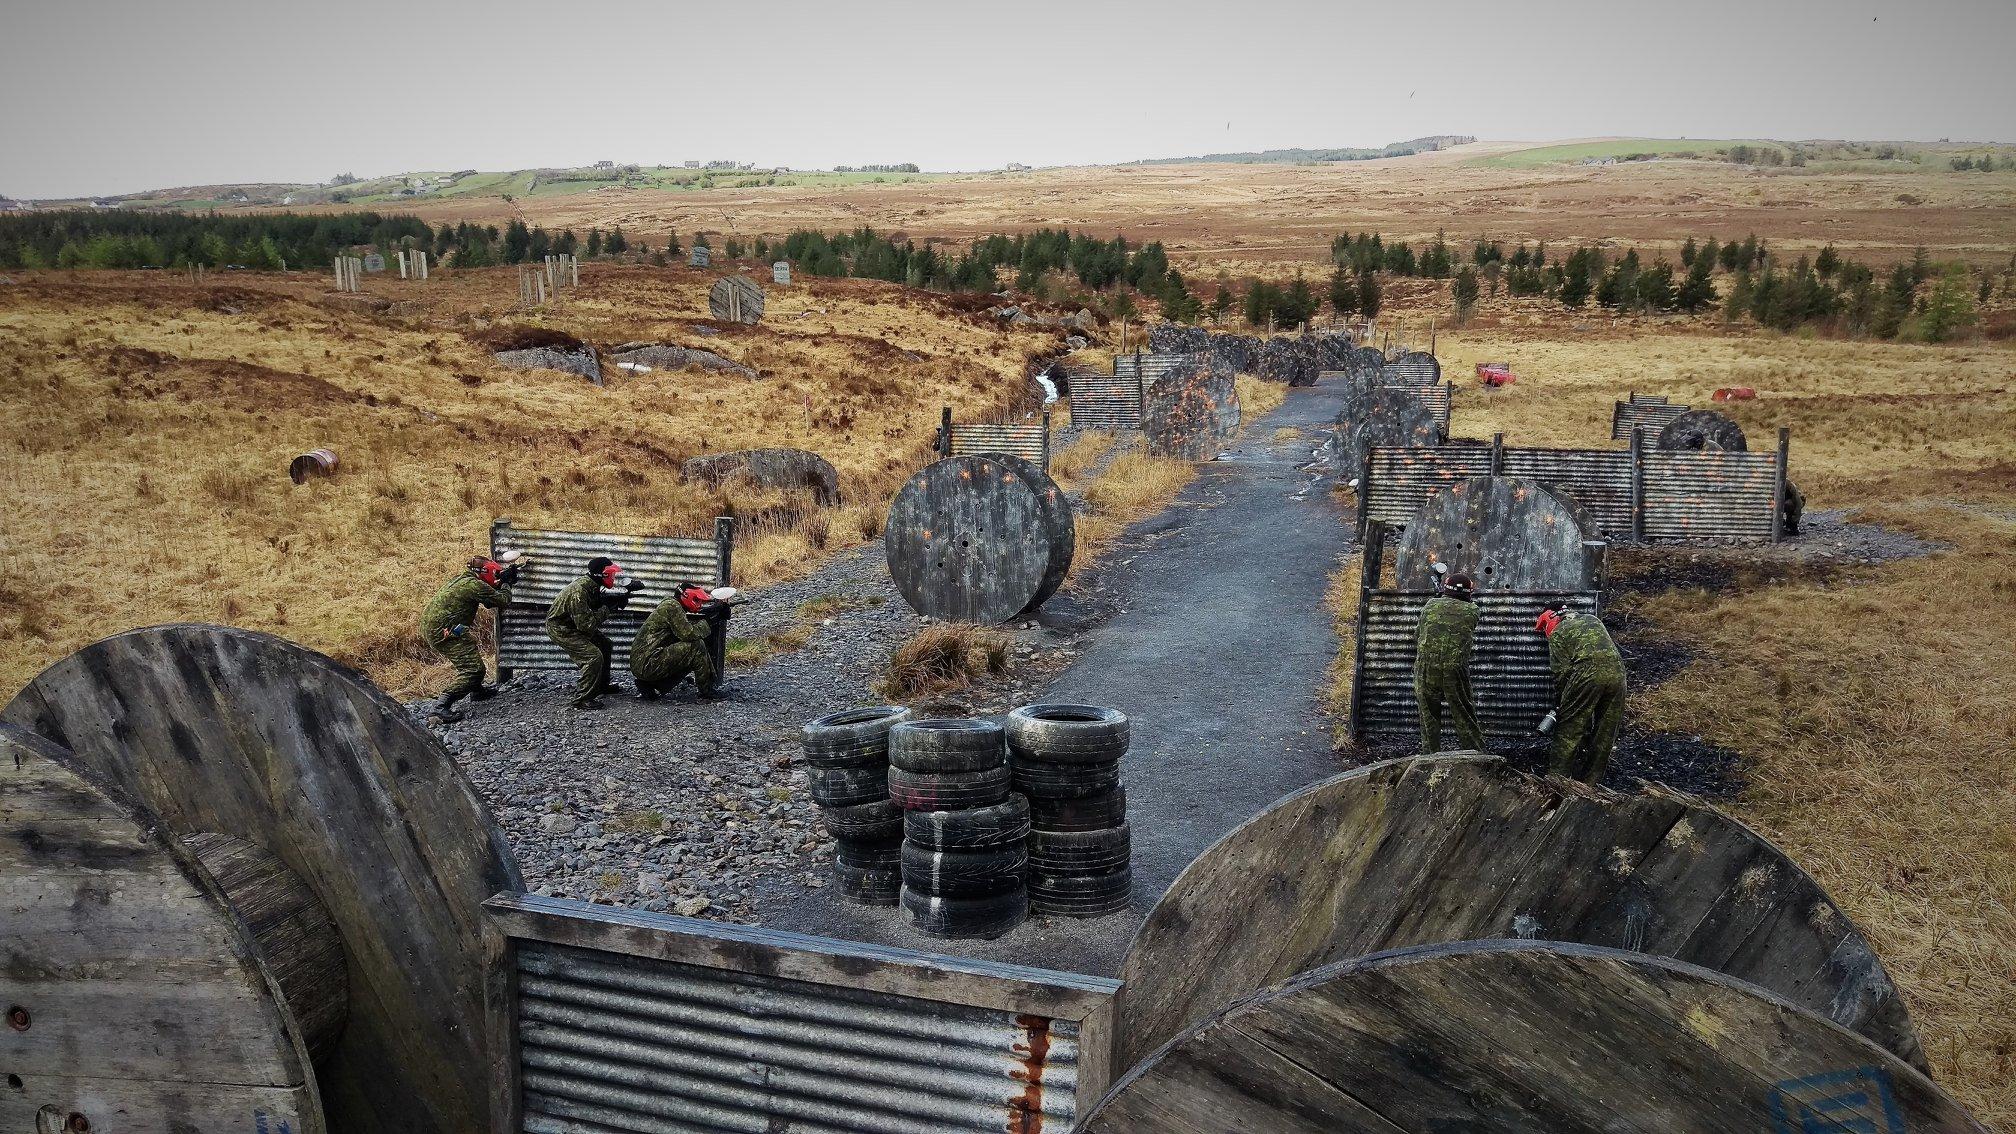 Eilemental Activity Park in Galway - Visit Galway